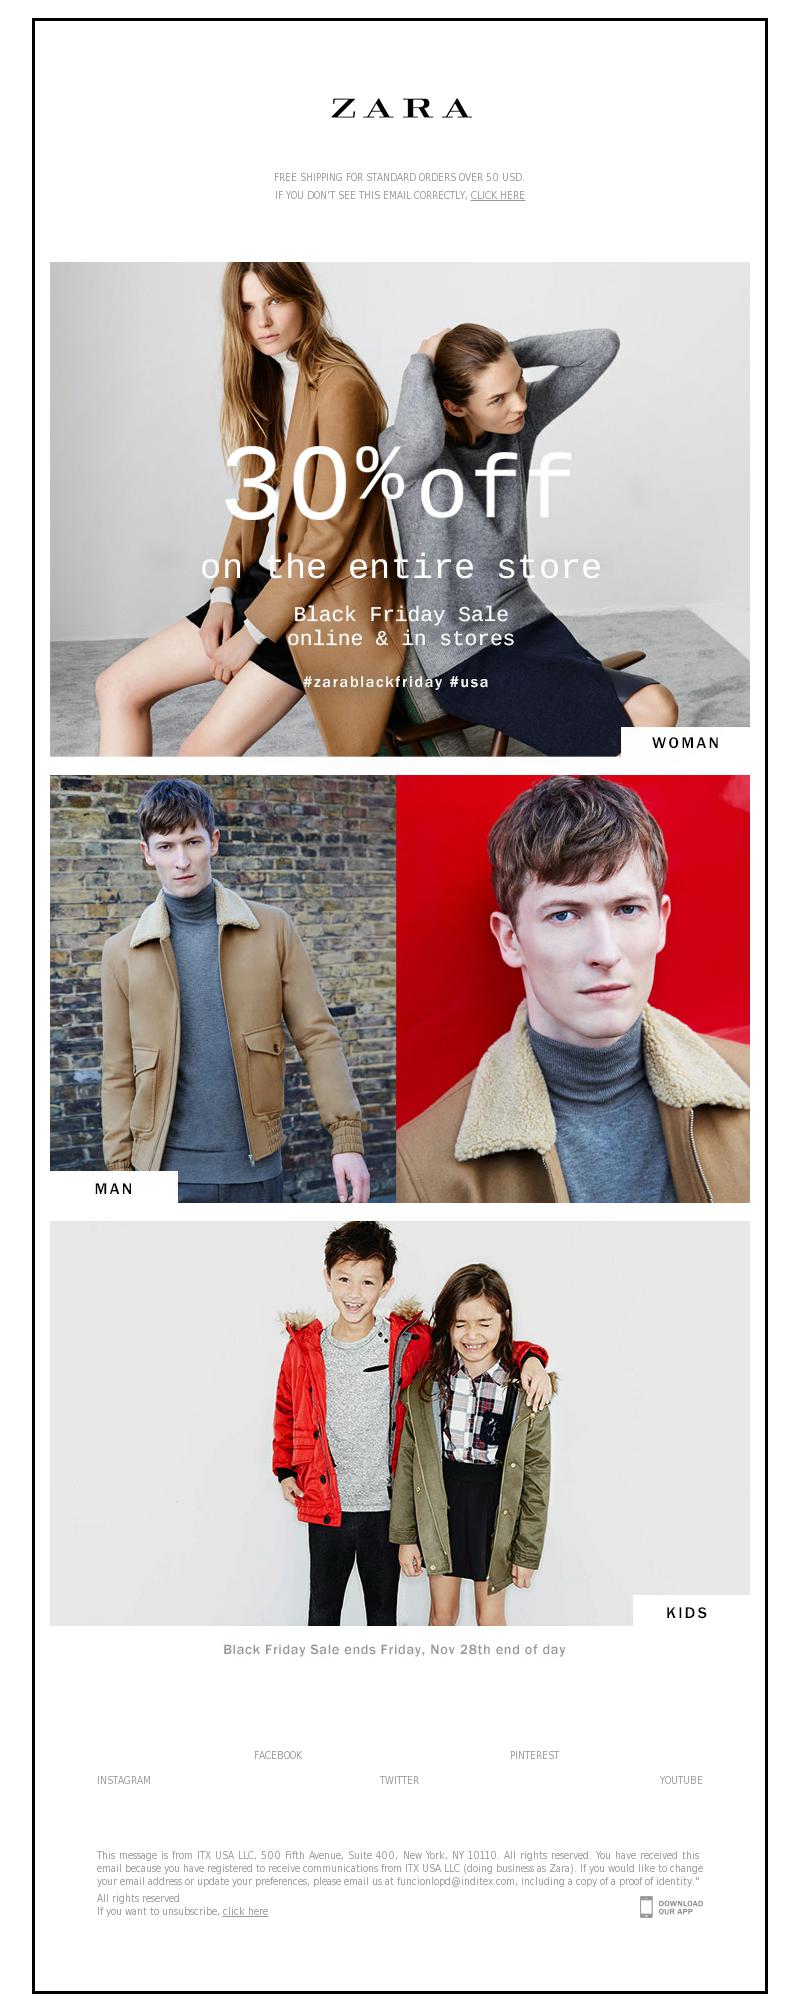 Zara Email Marketing Examples